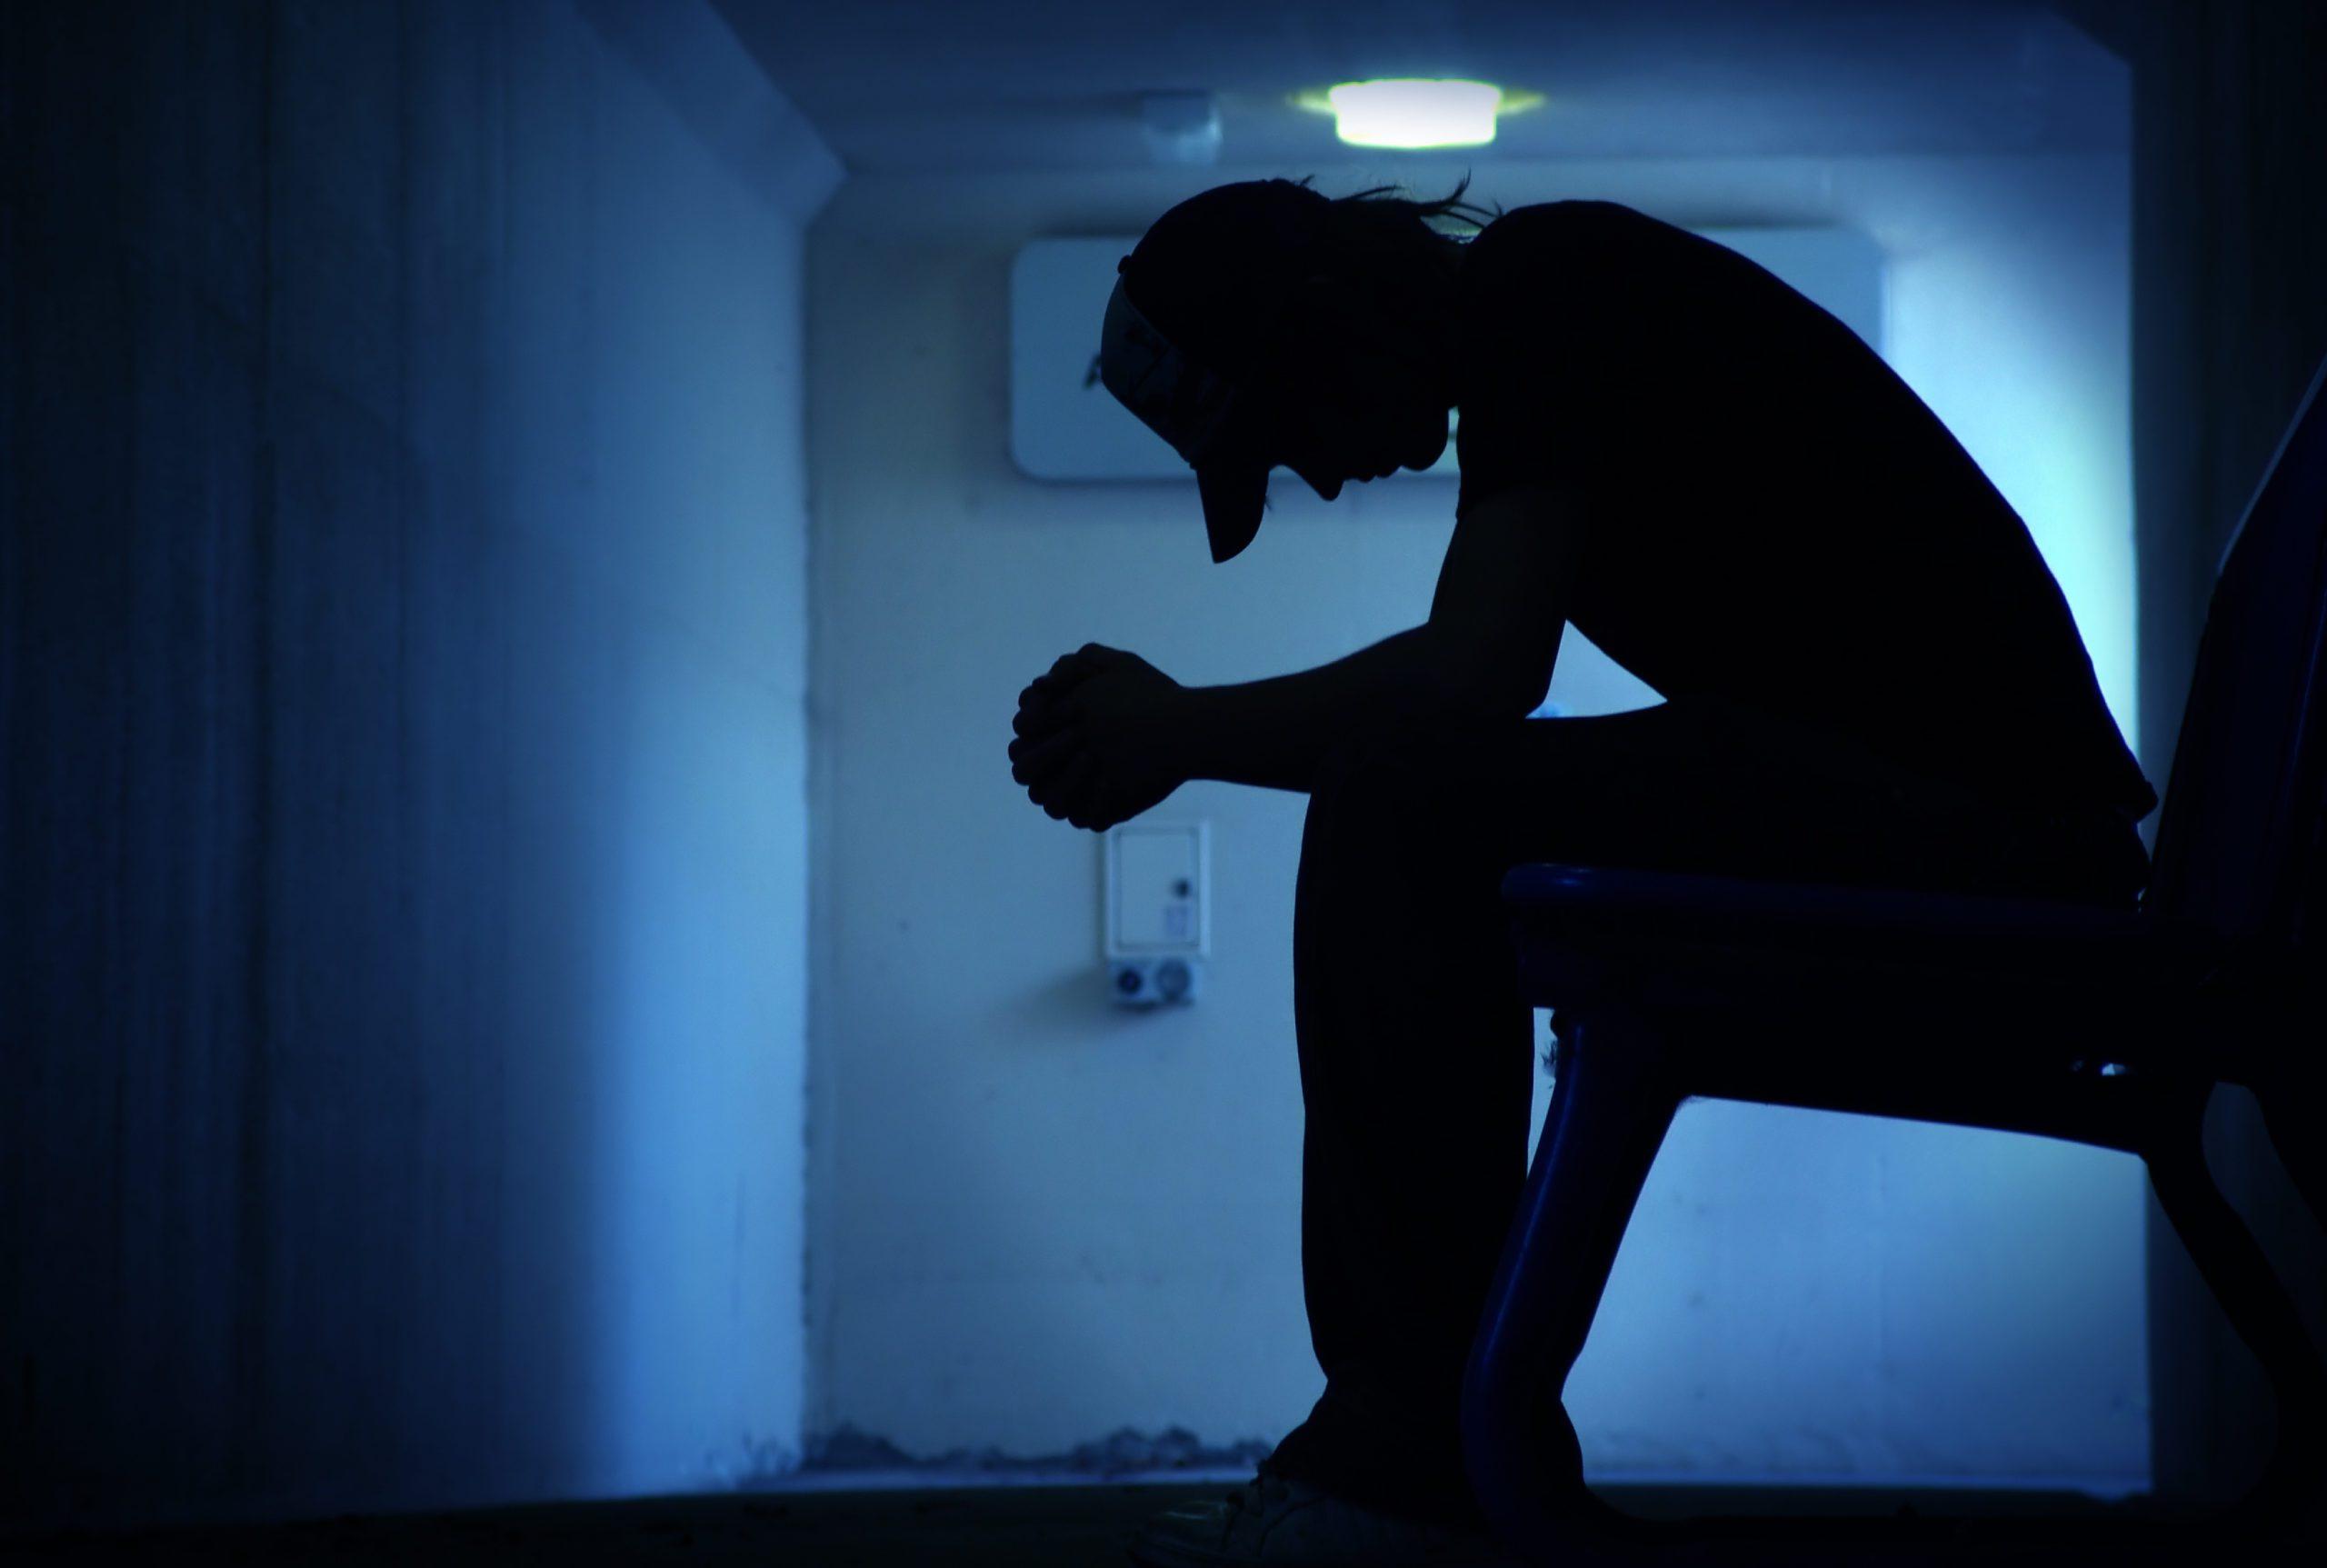 Celebrity Suicides Raise Depression Alarms